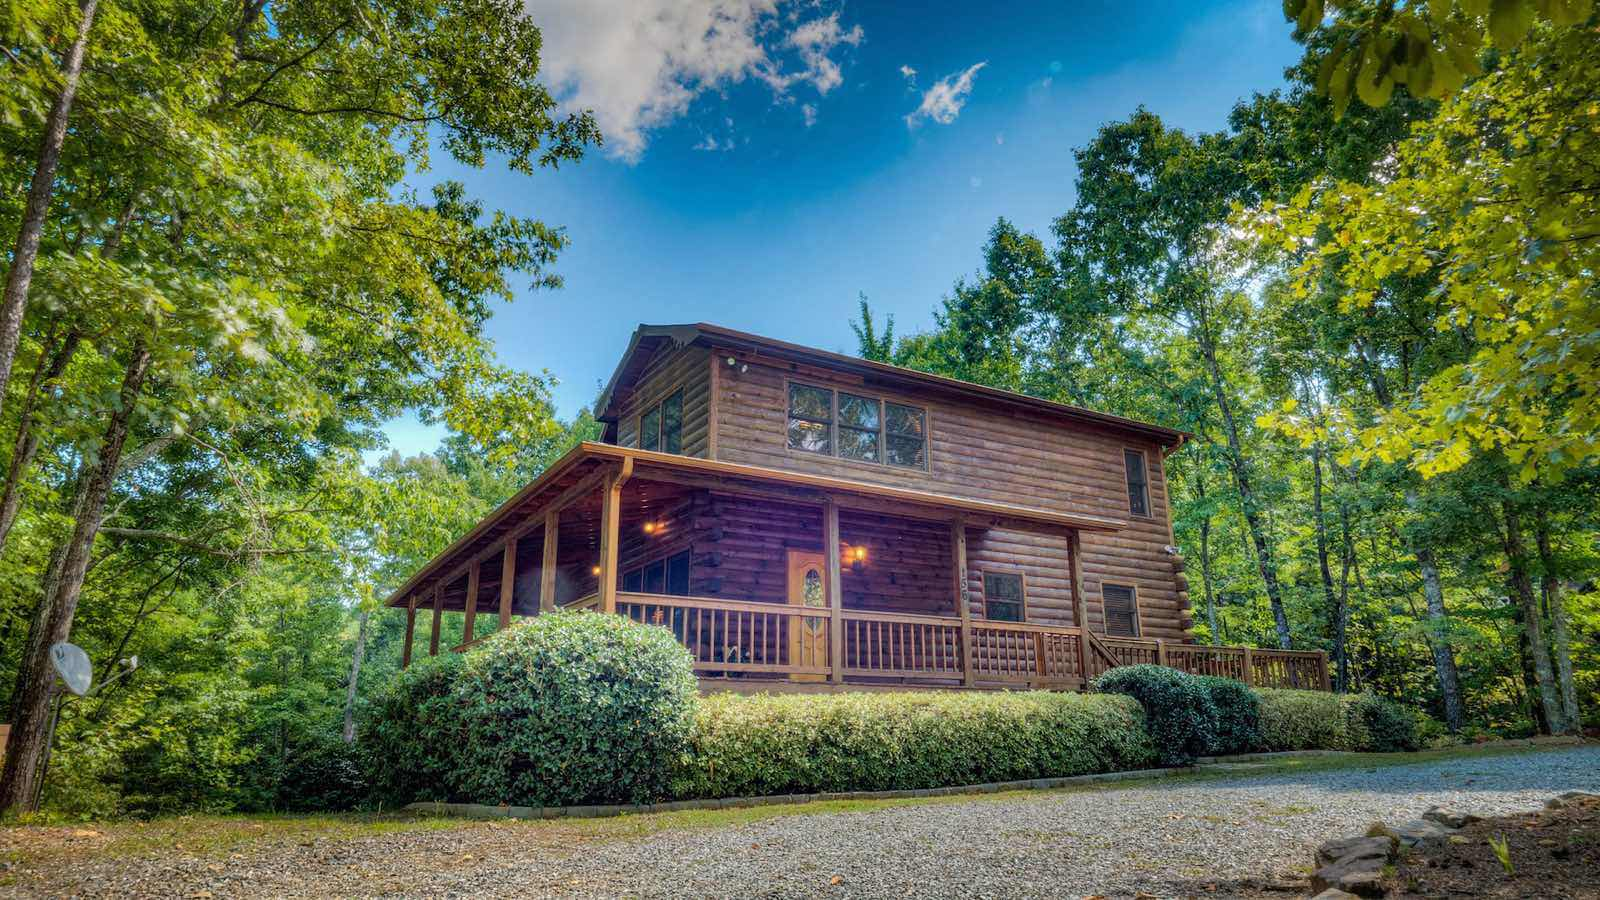 North Georgia Mountain Cabin Rentals 3 Bedroom Cabin Rentals